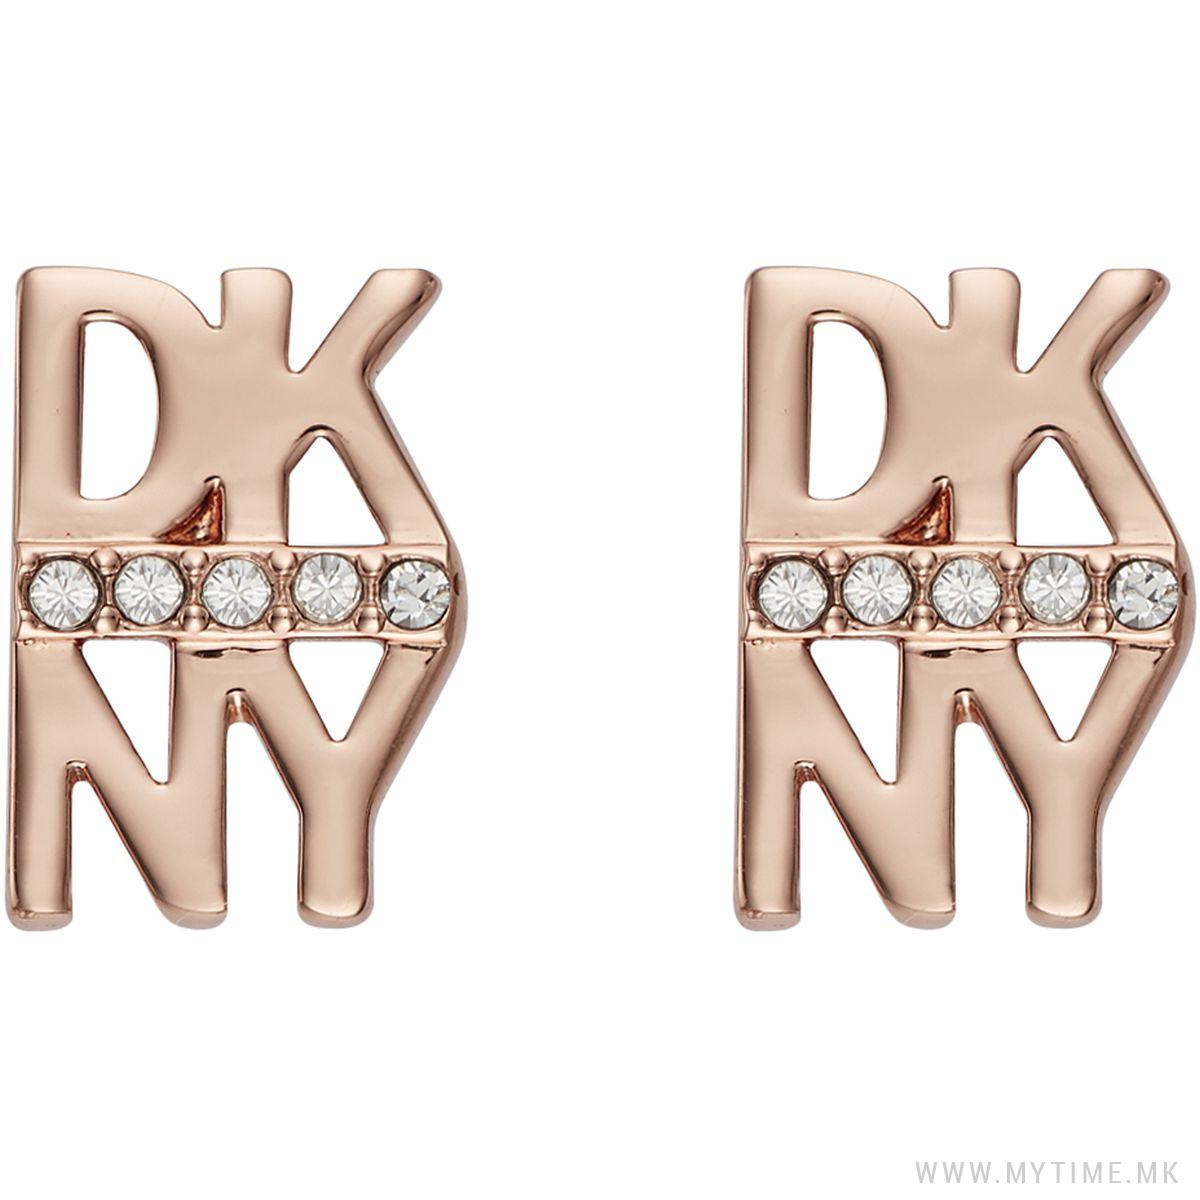 5520005 DKNY New York